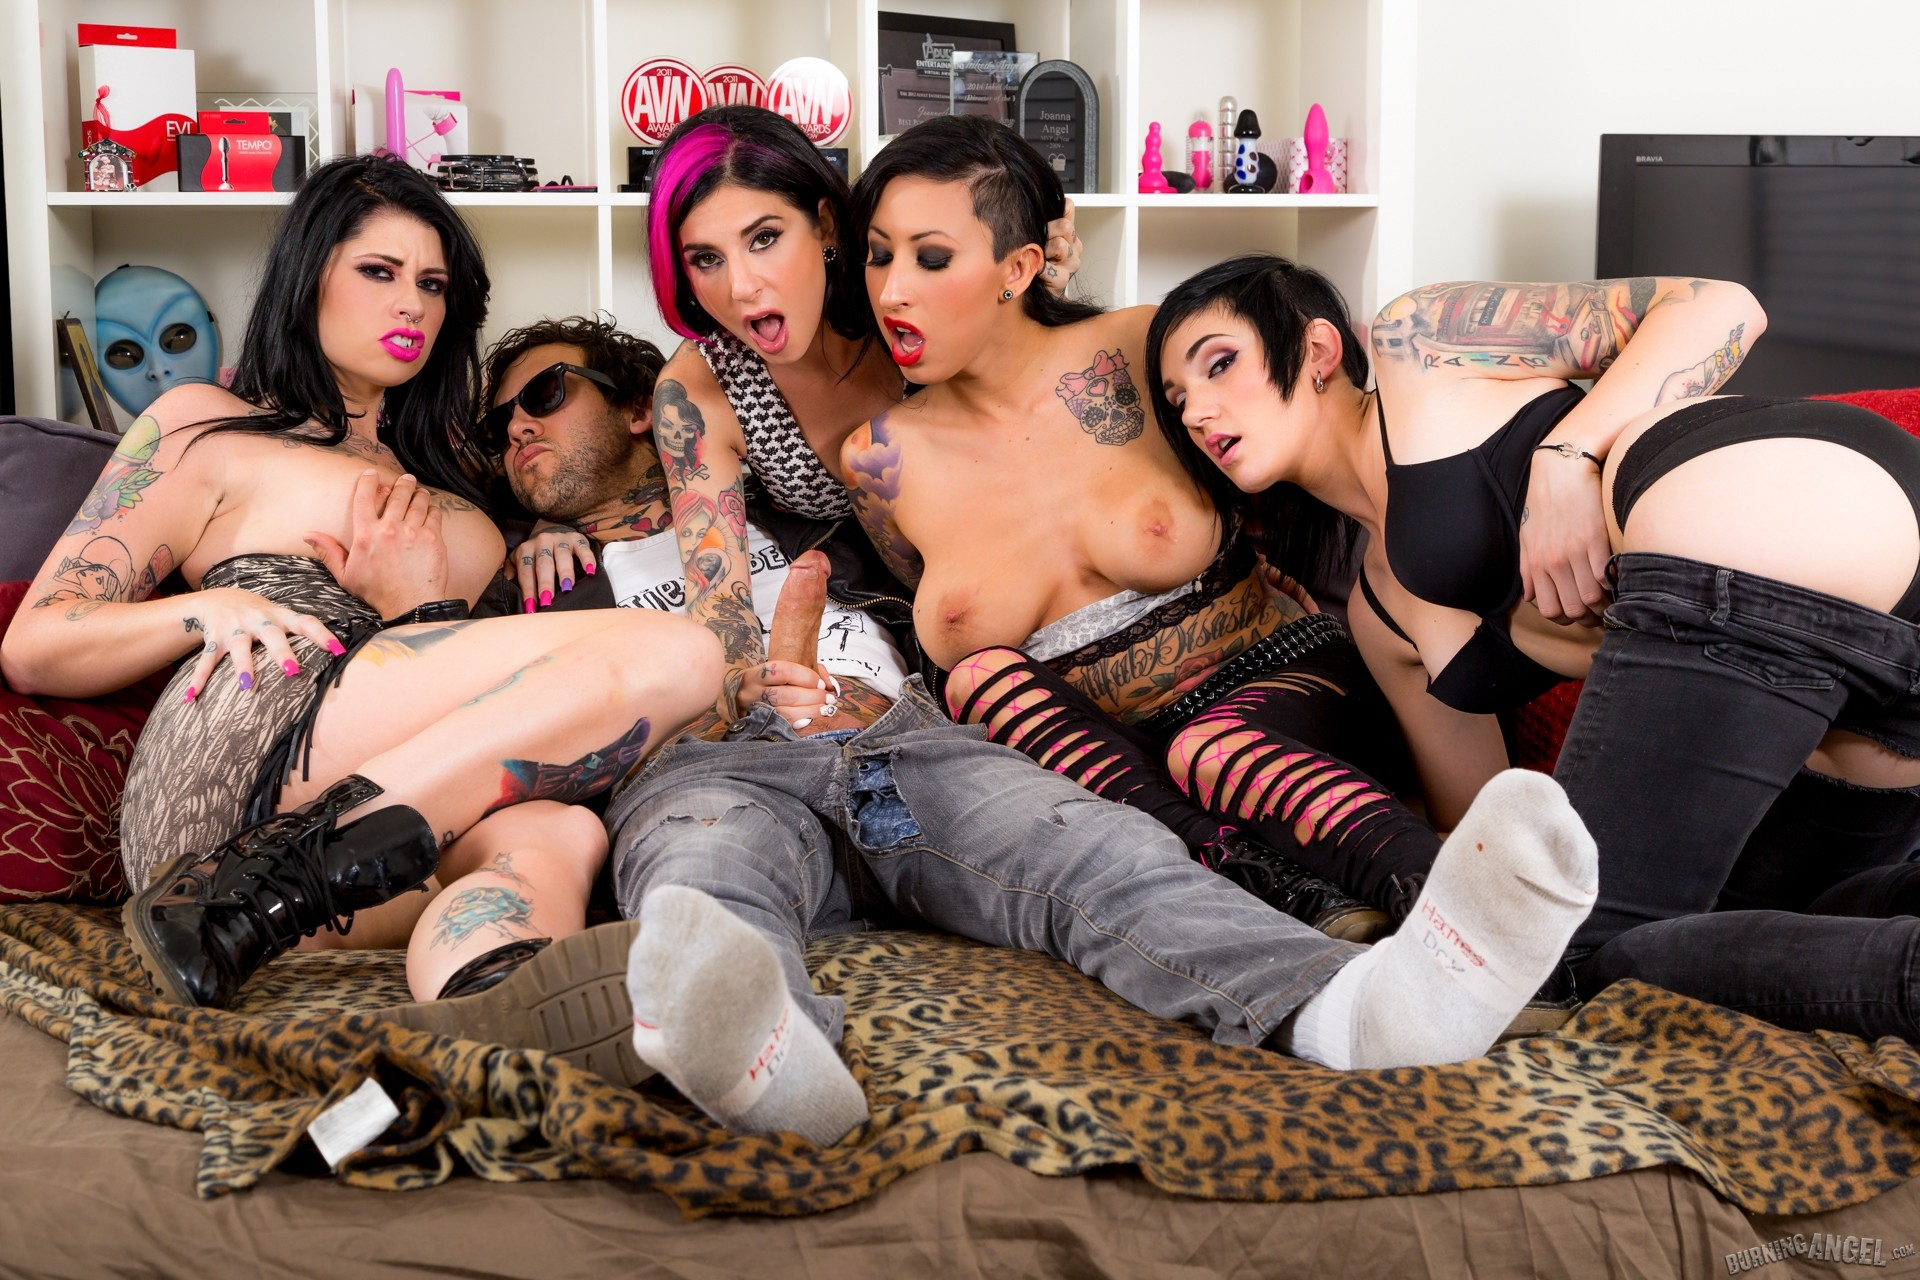 xxx-the-band-sexy-girls-and-nacked-girls-hump-fucking-hard